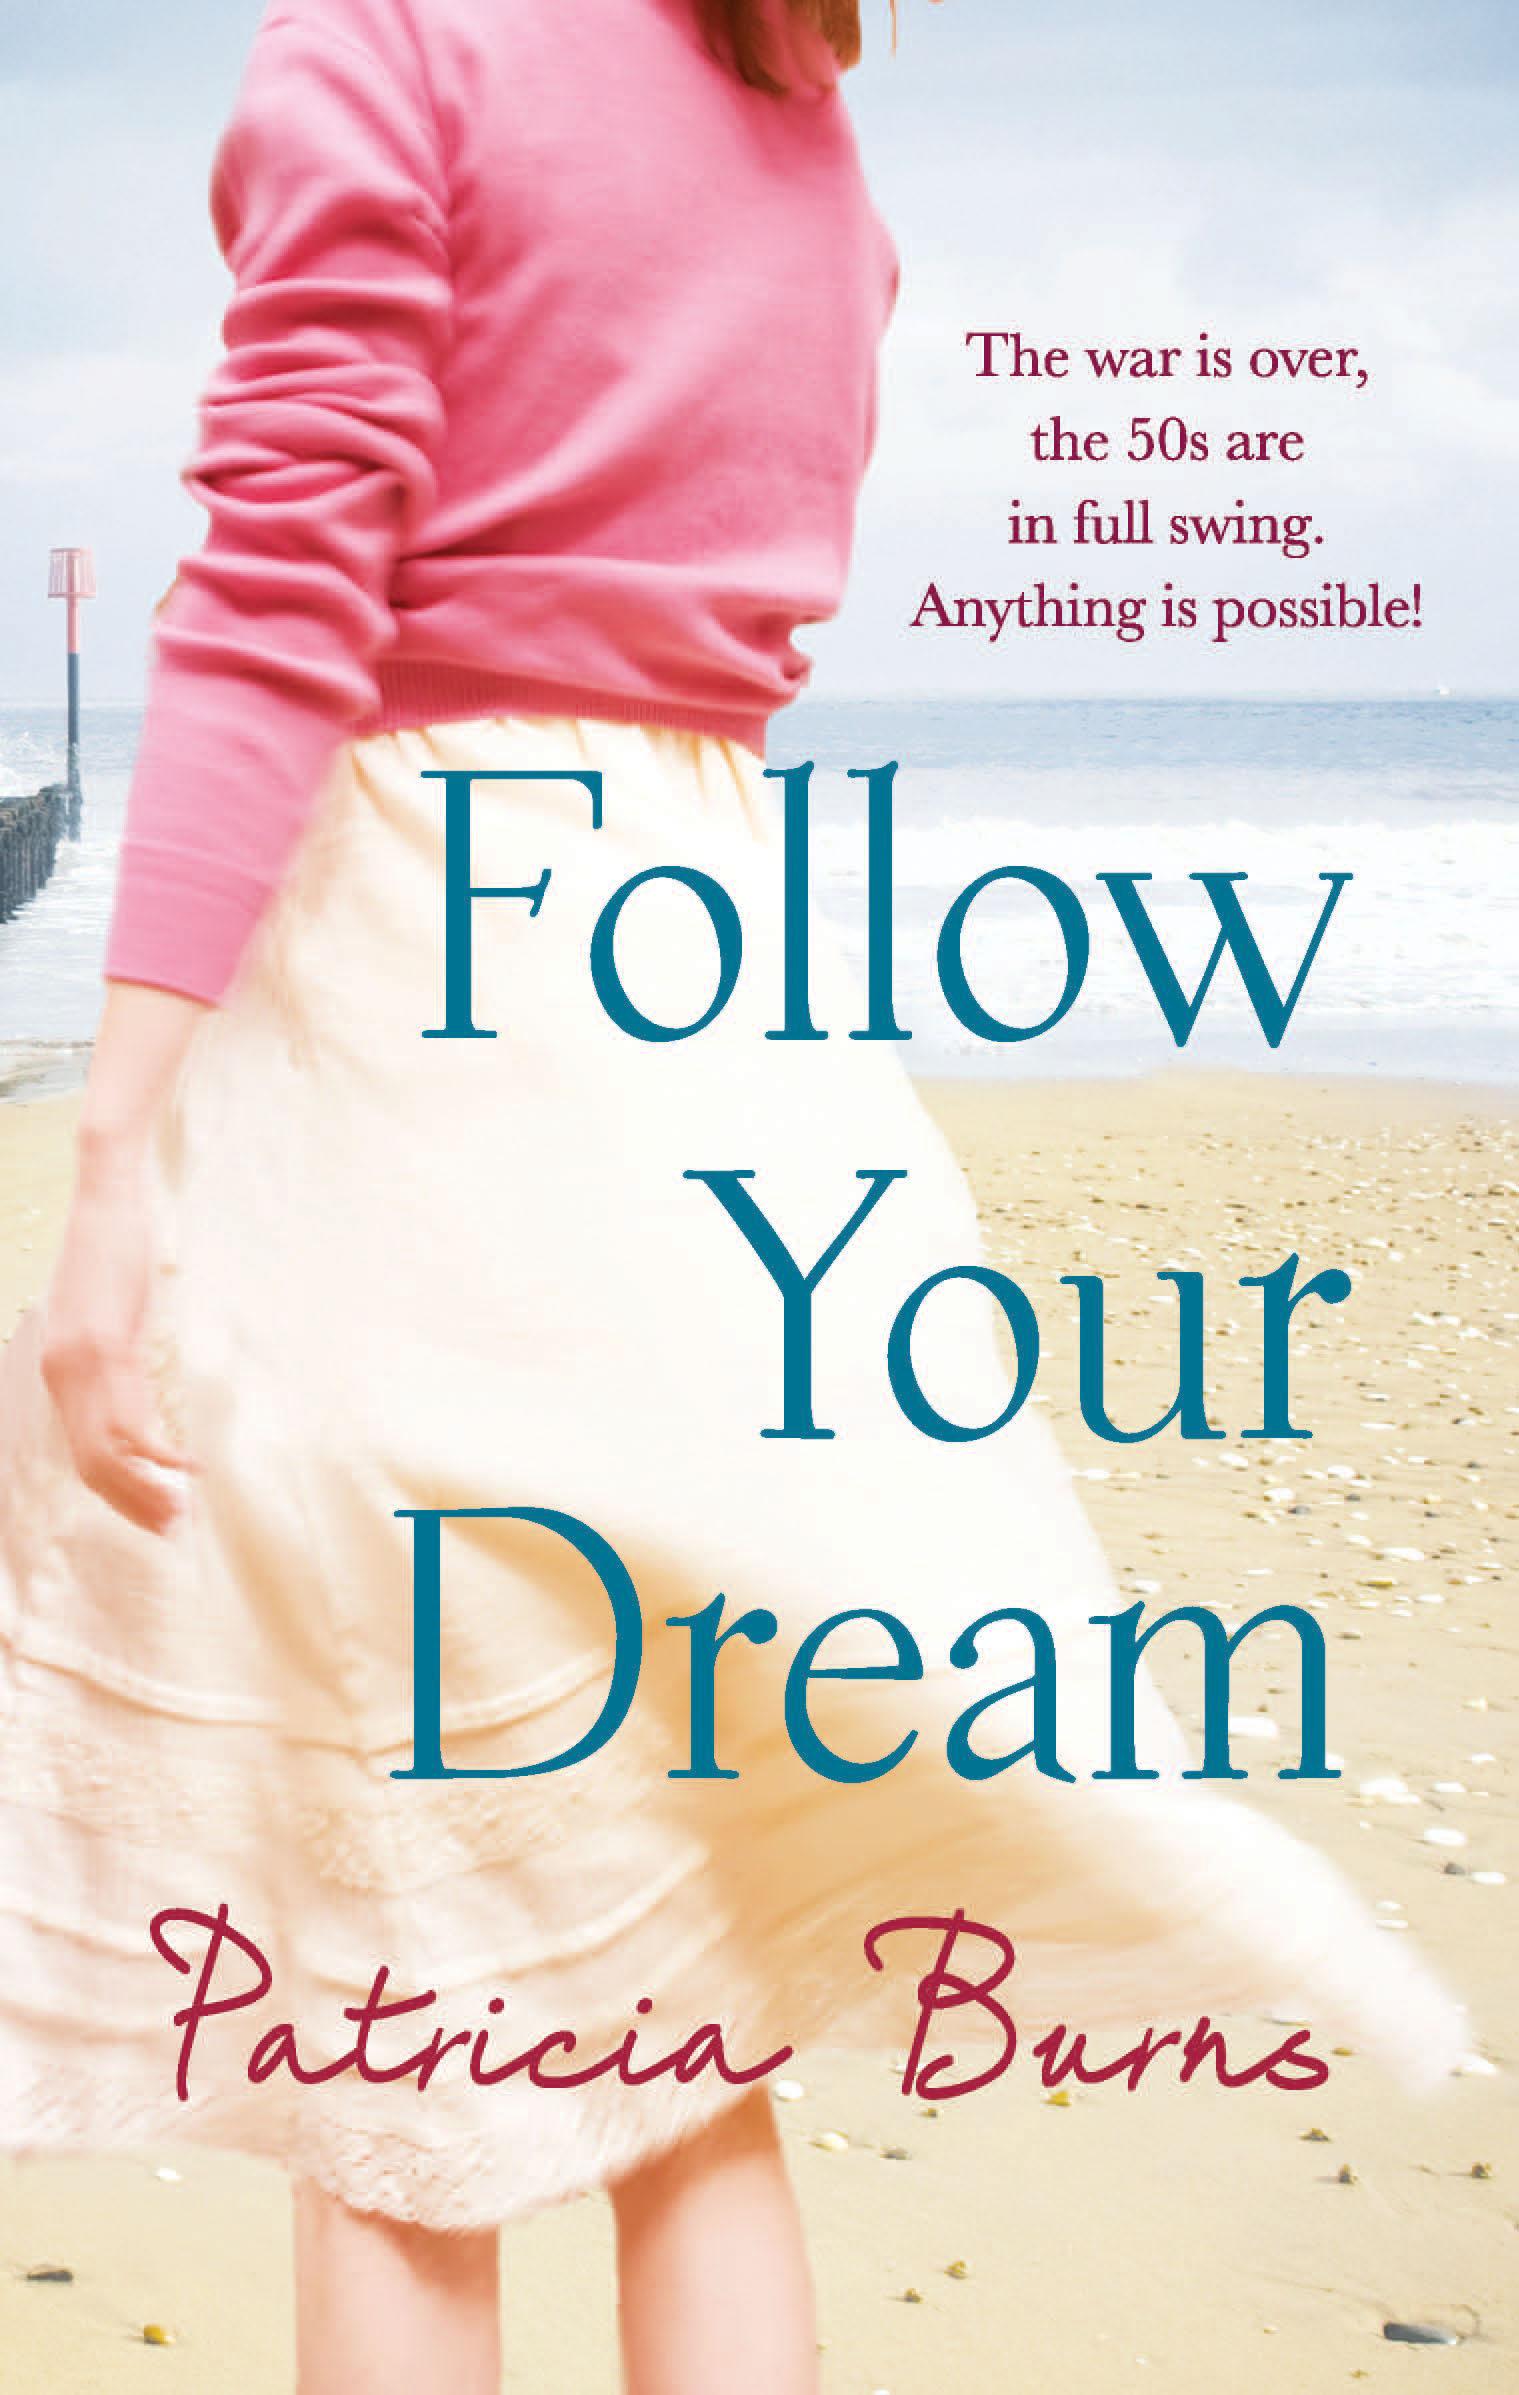 Patricia Burns Follow Your Dream майка классическая printio follow your dream